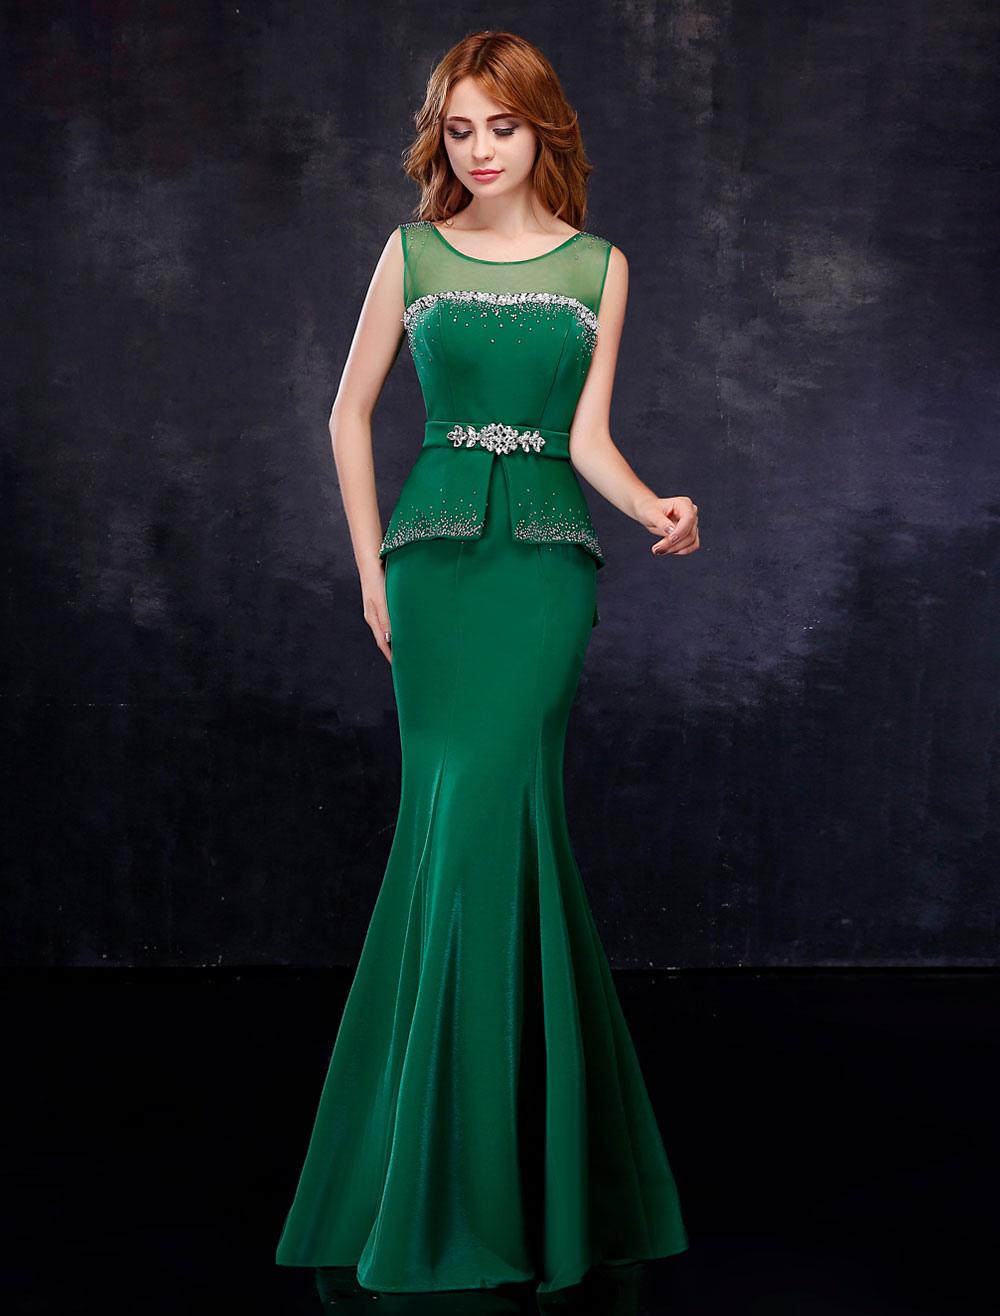 Evening Dresses Peplum Satin Rhinestone Hunter Green Evening Gown Backless Mermaid Formal Dress With Sash (Wedding) photo